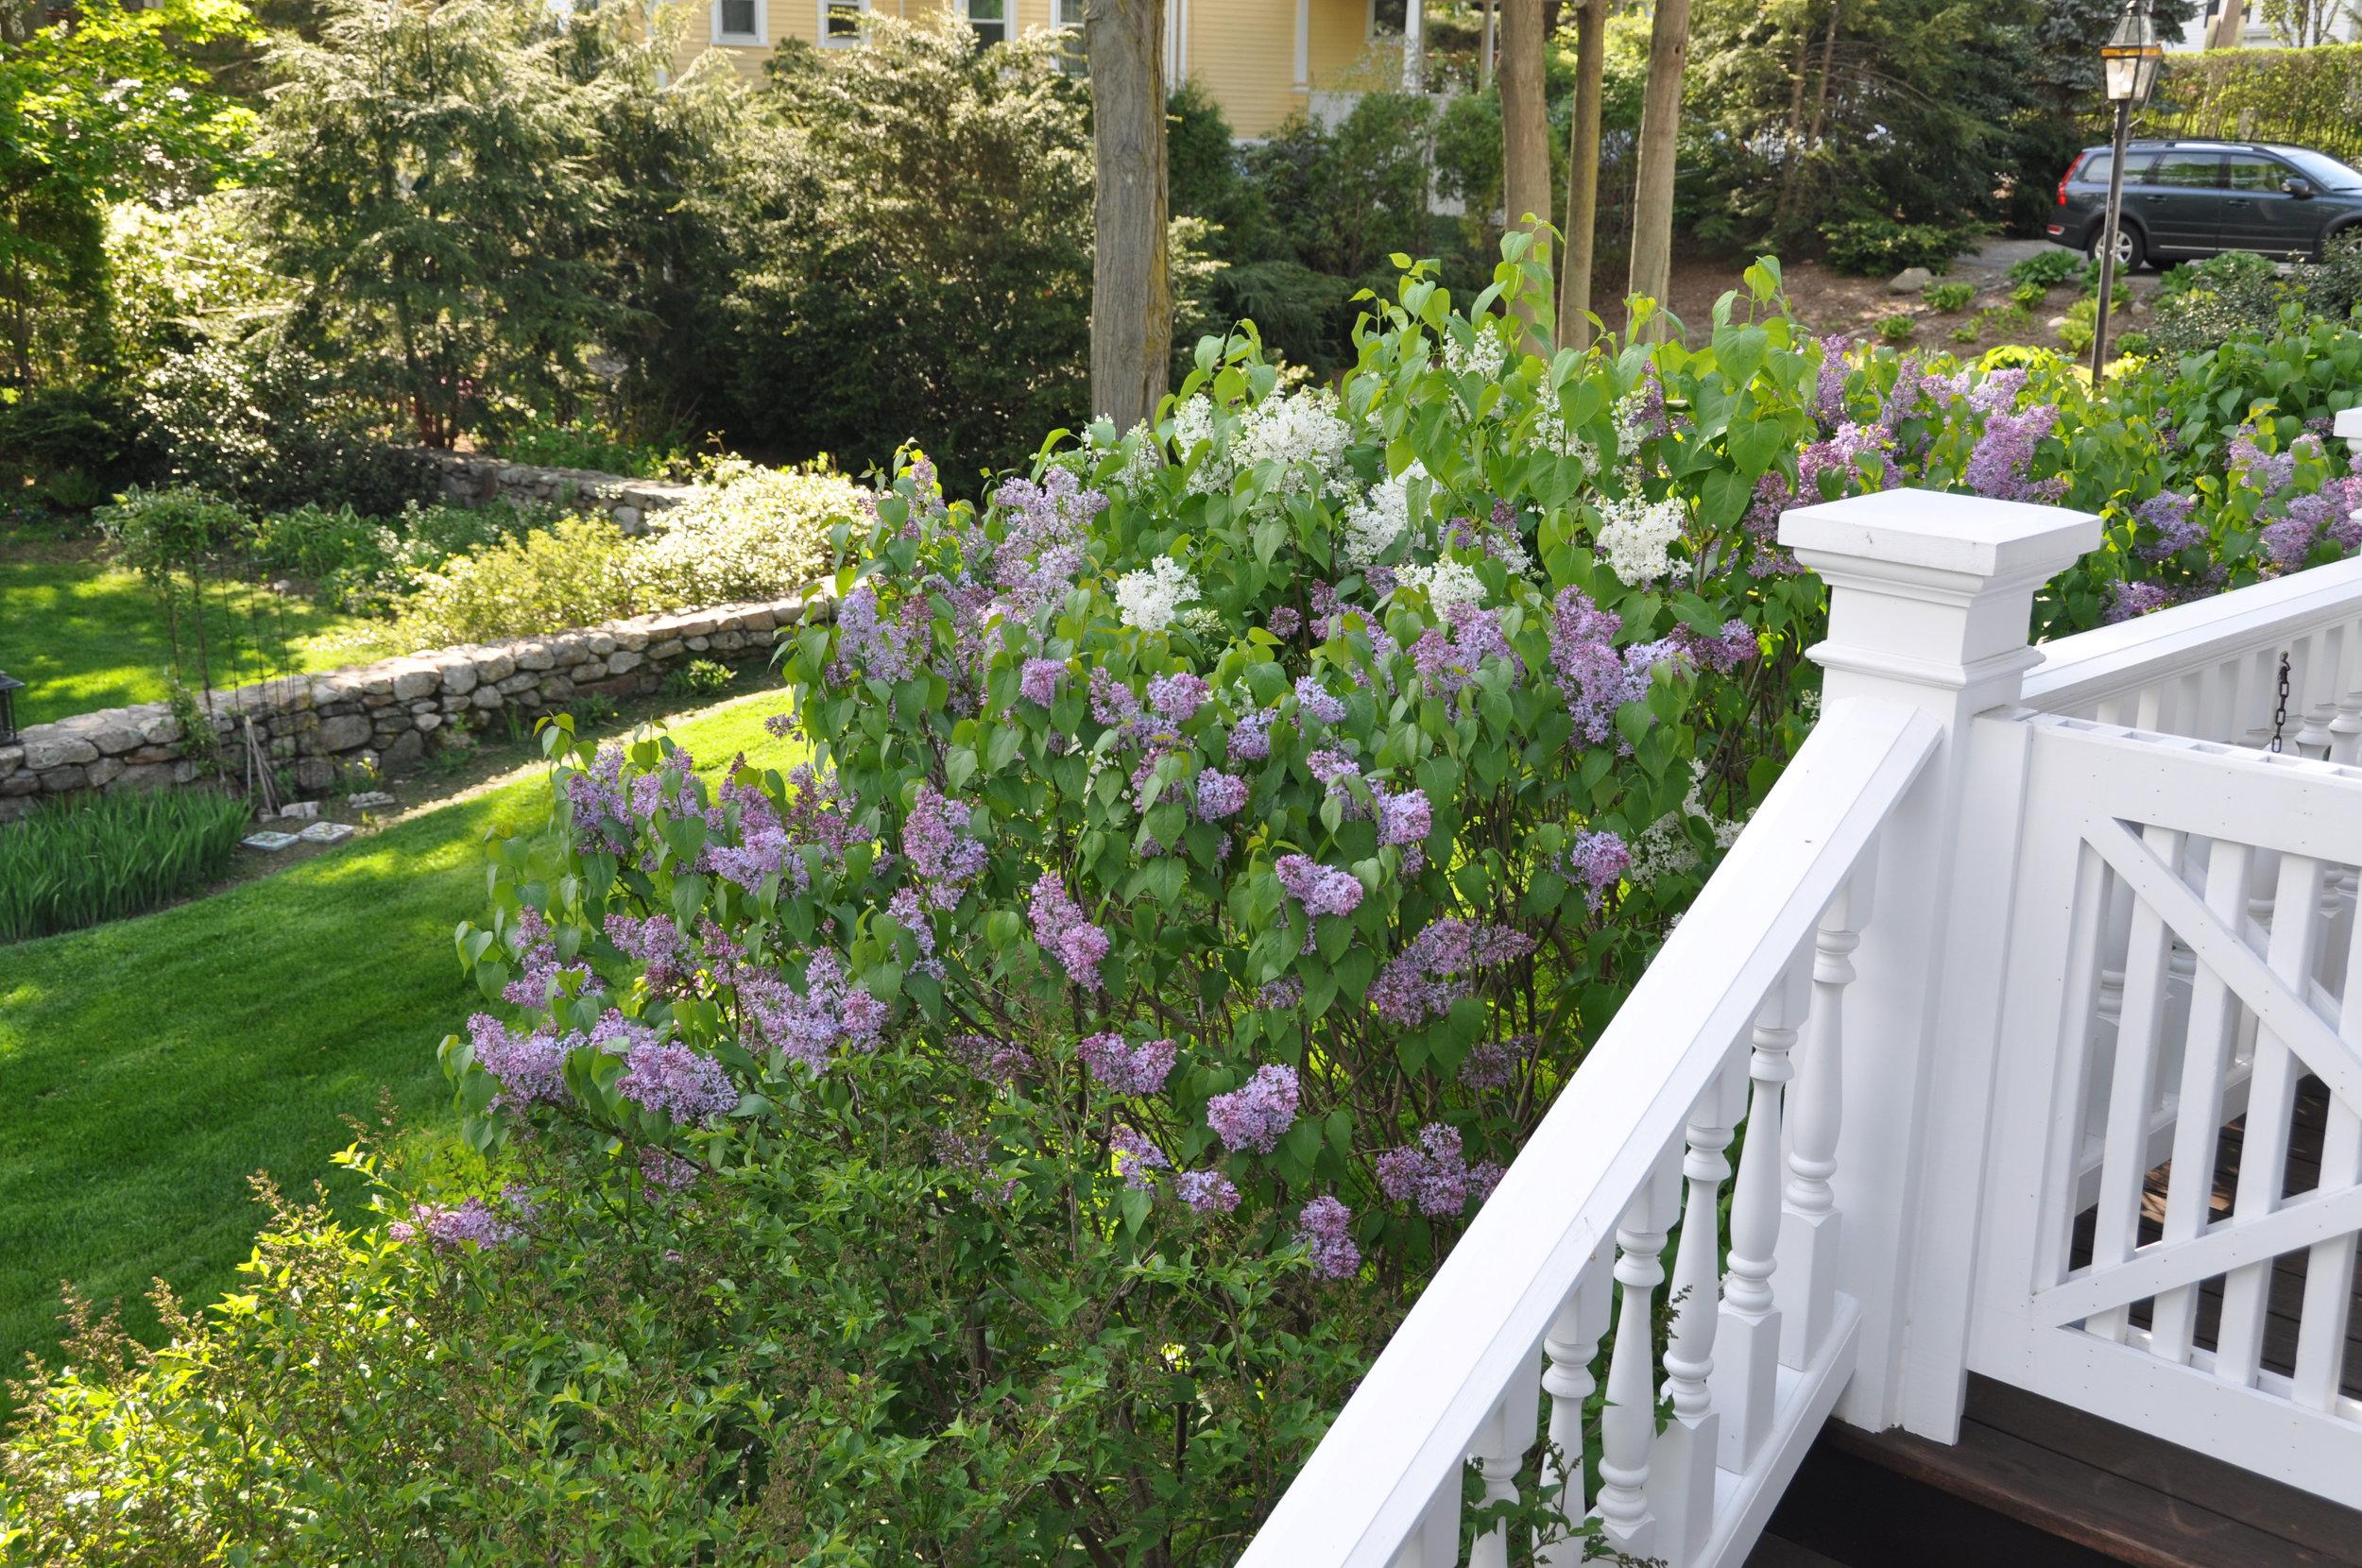 Lilacs in bloom beside the railing to verandah.jpg